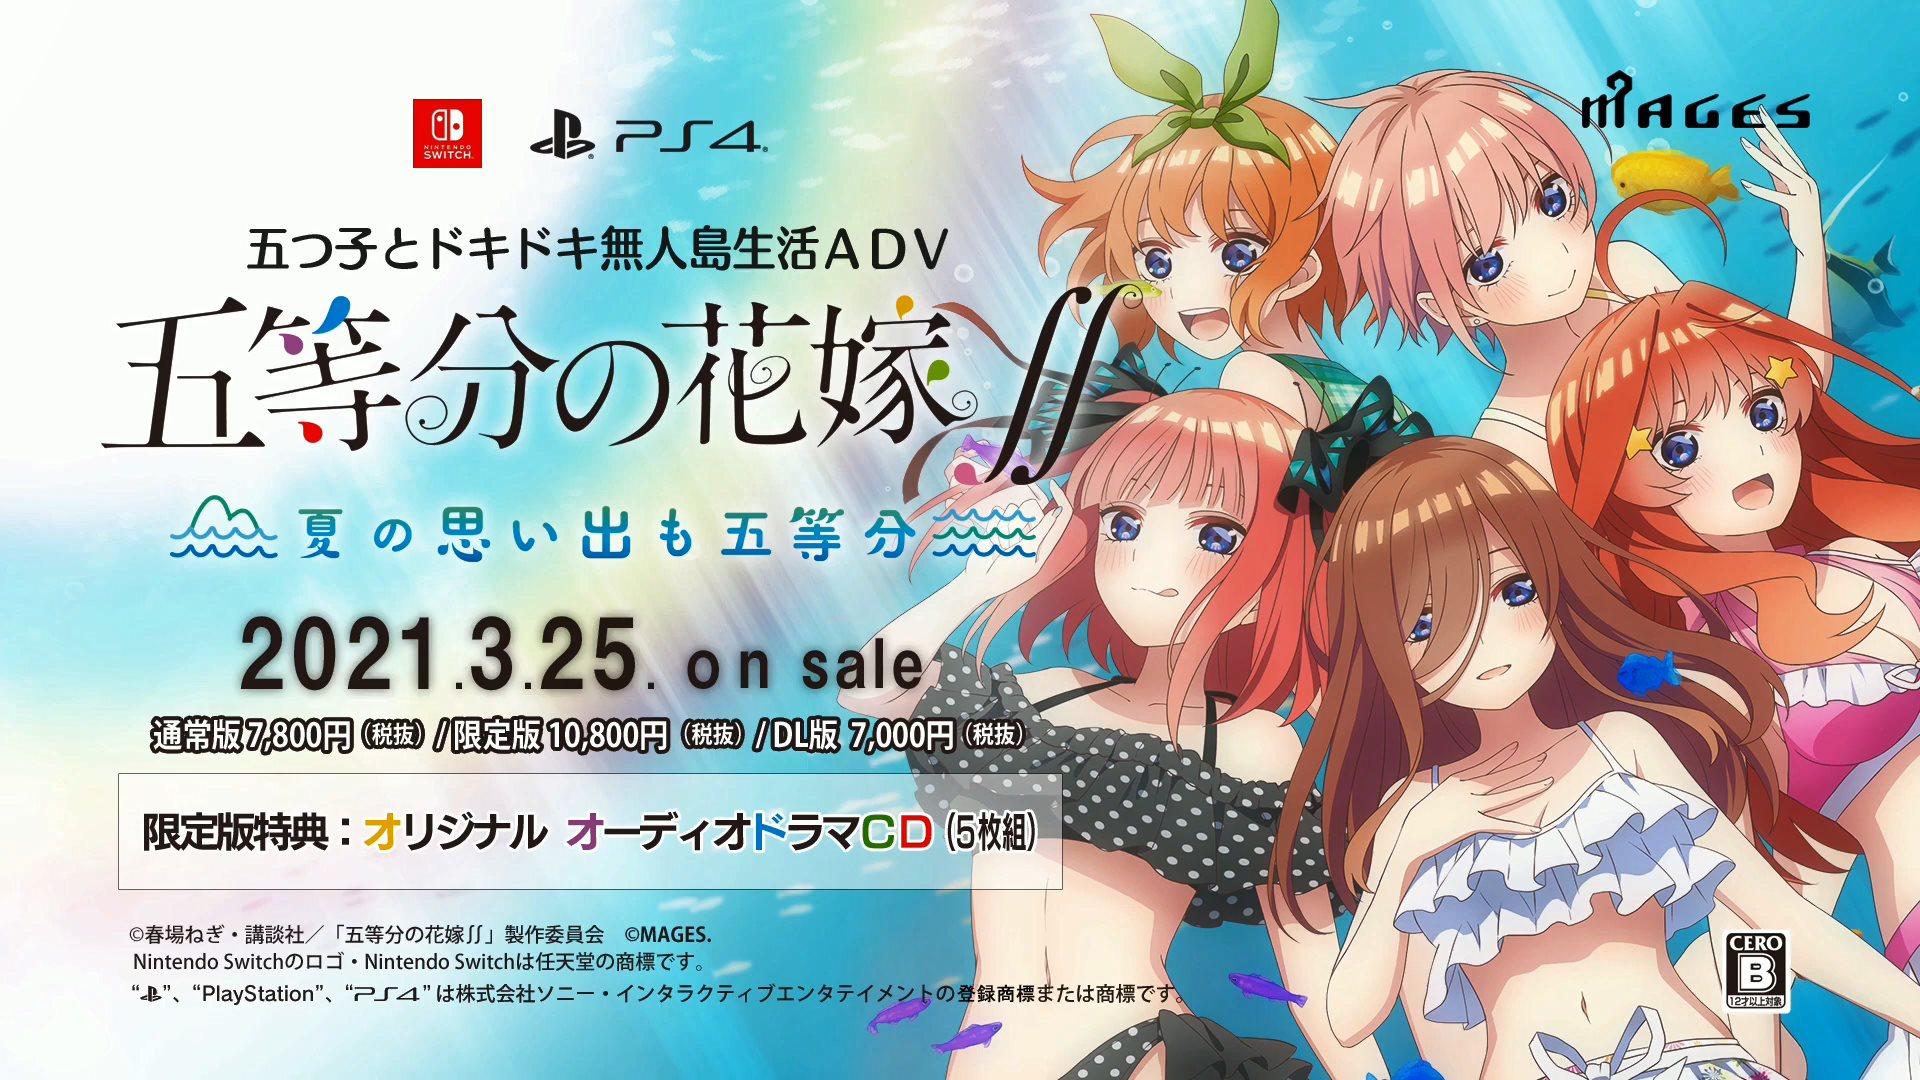 PS4/Switch《五等分的花嫁》OP释出 与五胞胎的无人岛生活